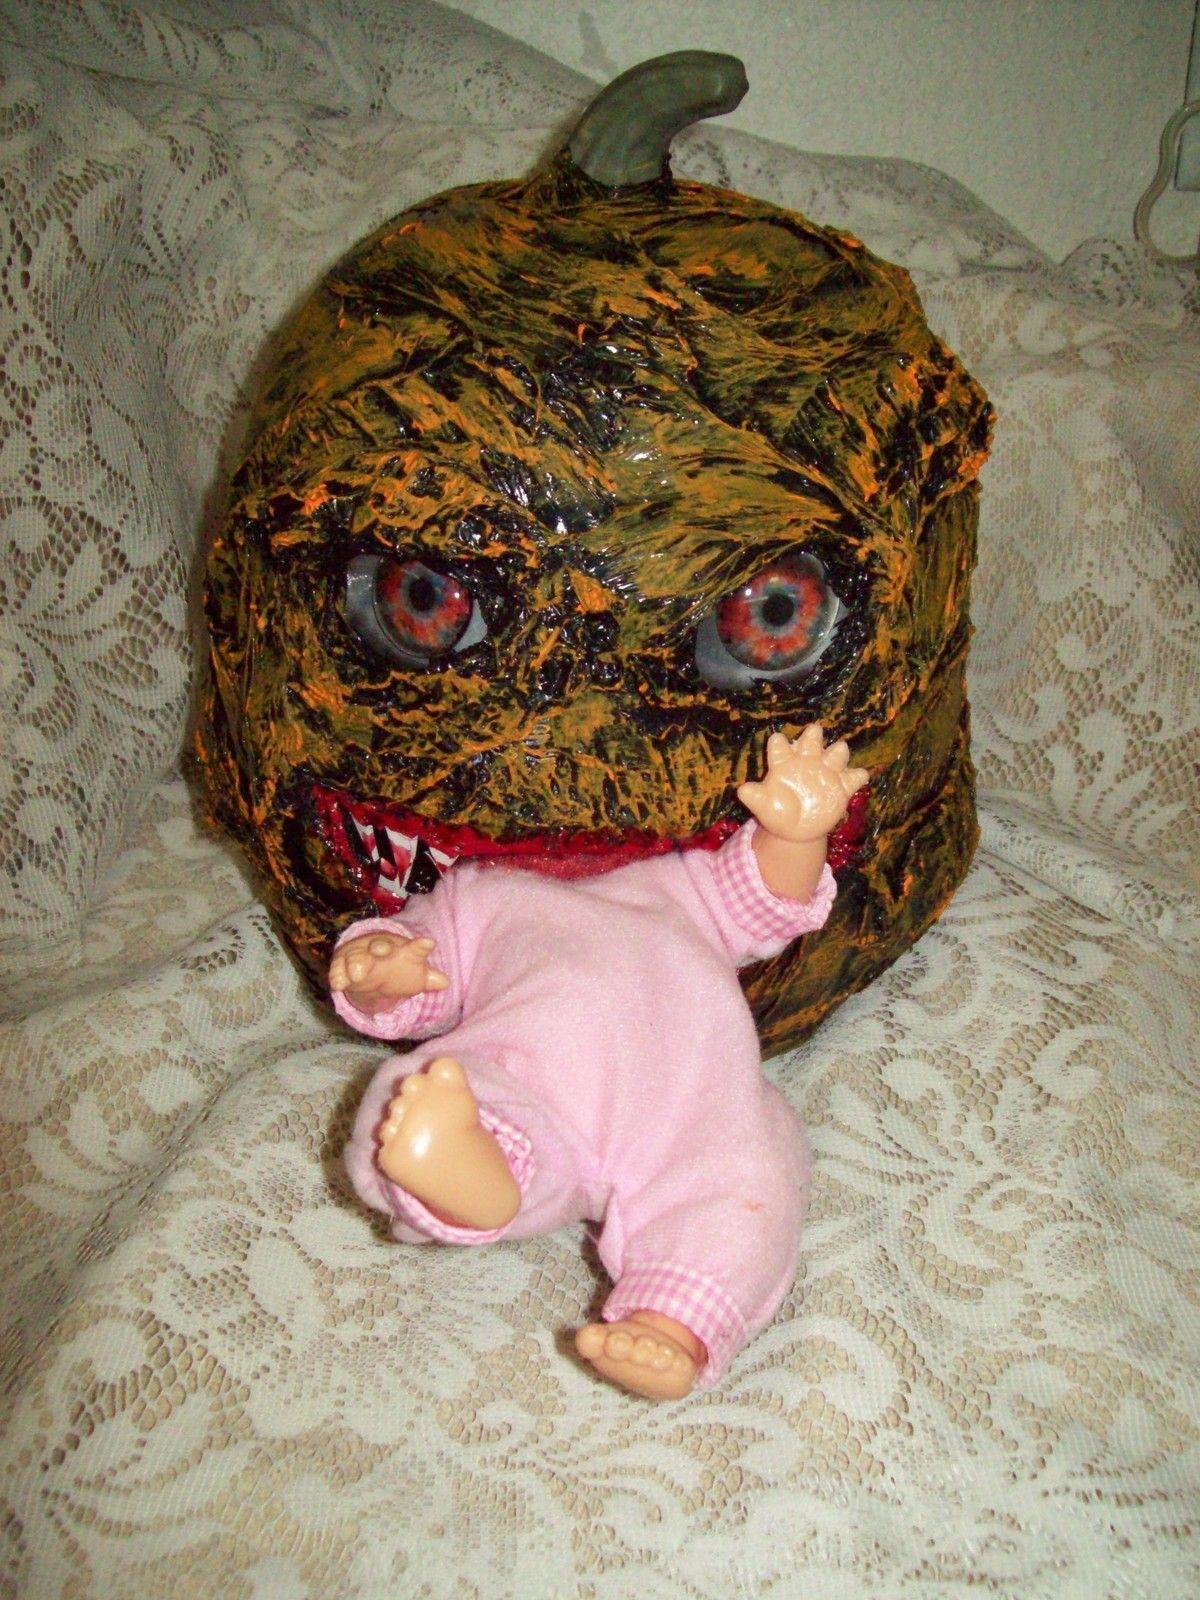 monster pumpkin eating baby halloween decor haunted house prop ebay - Halloween Decorations Ebay